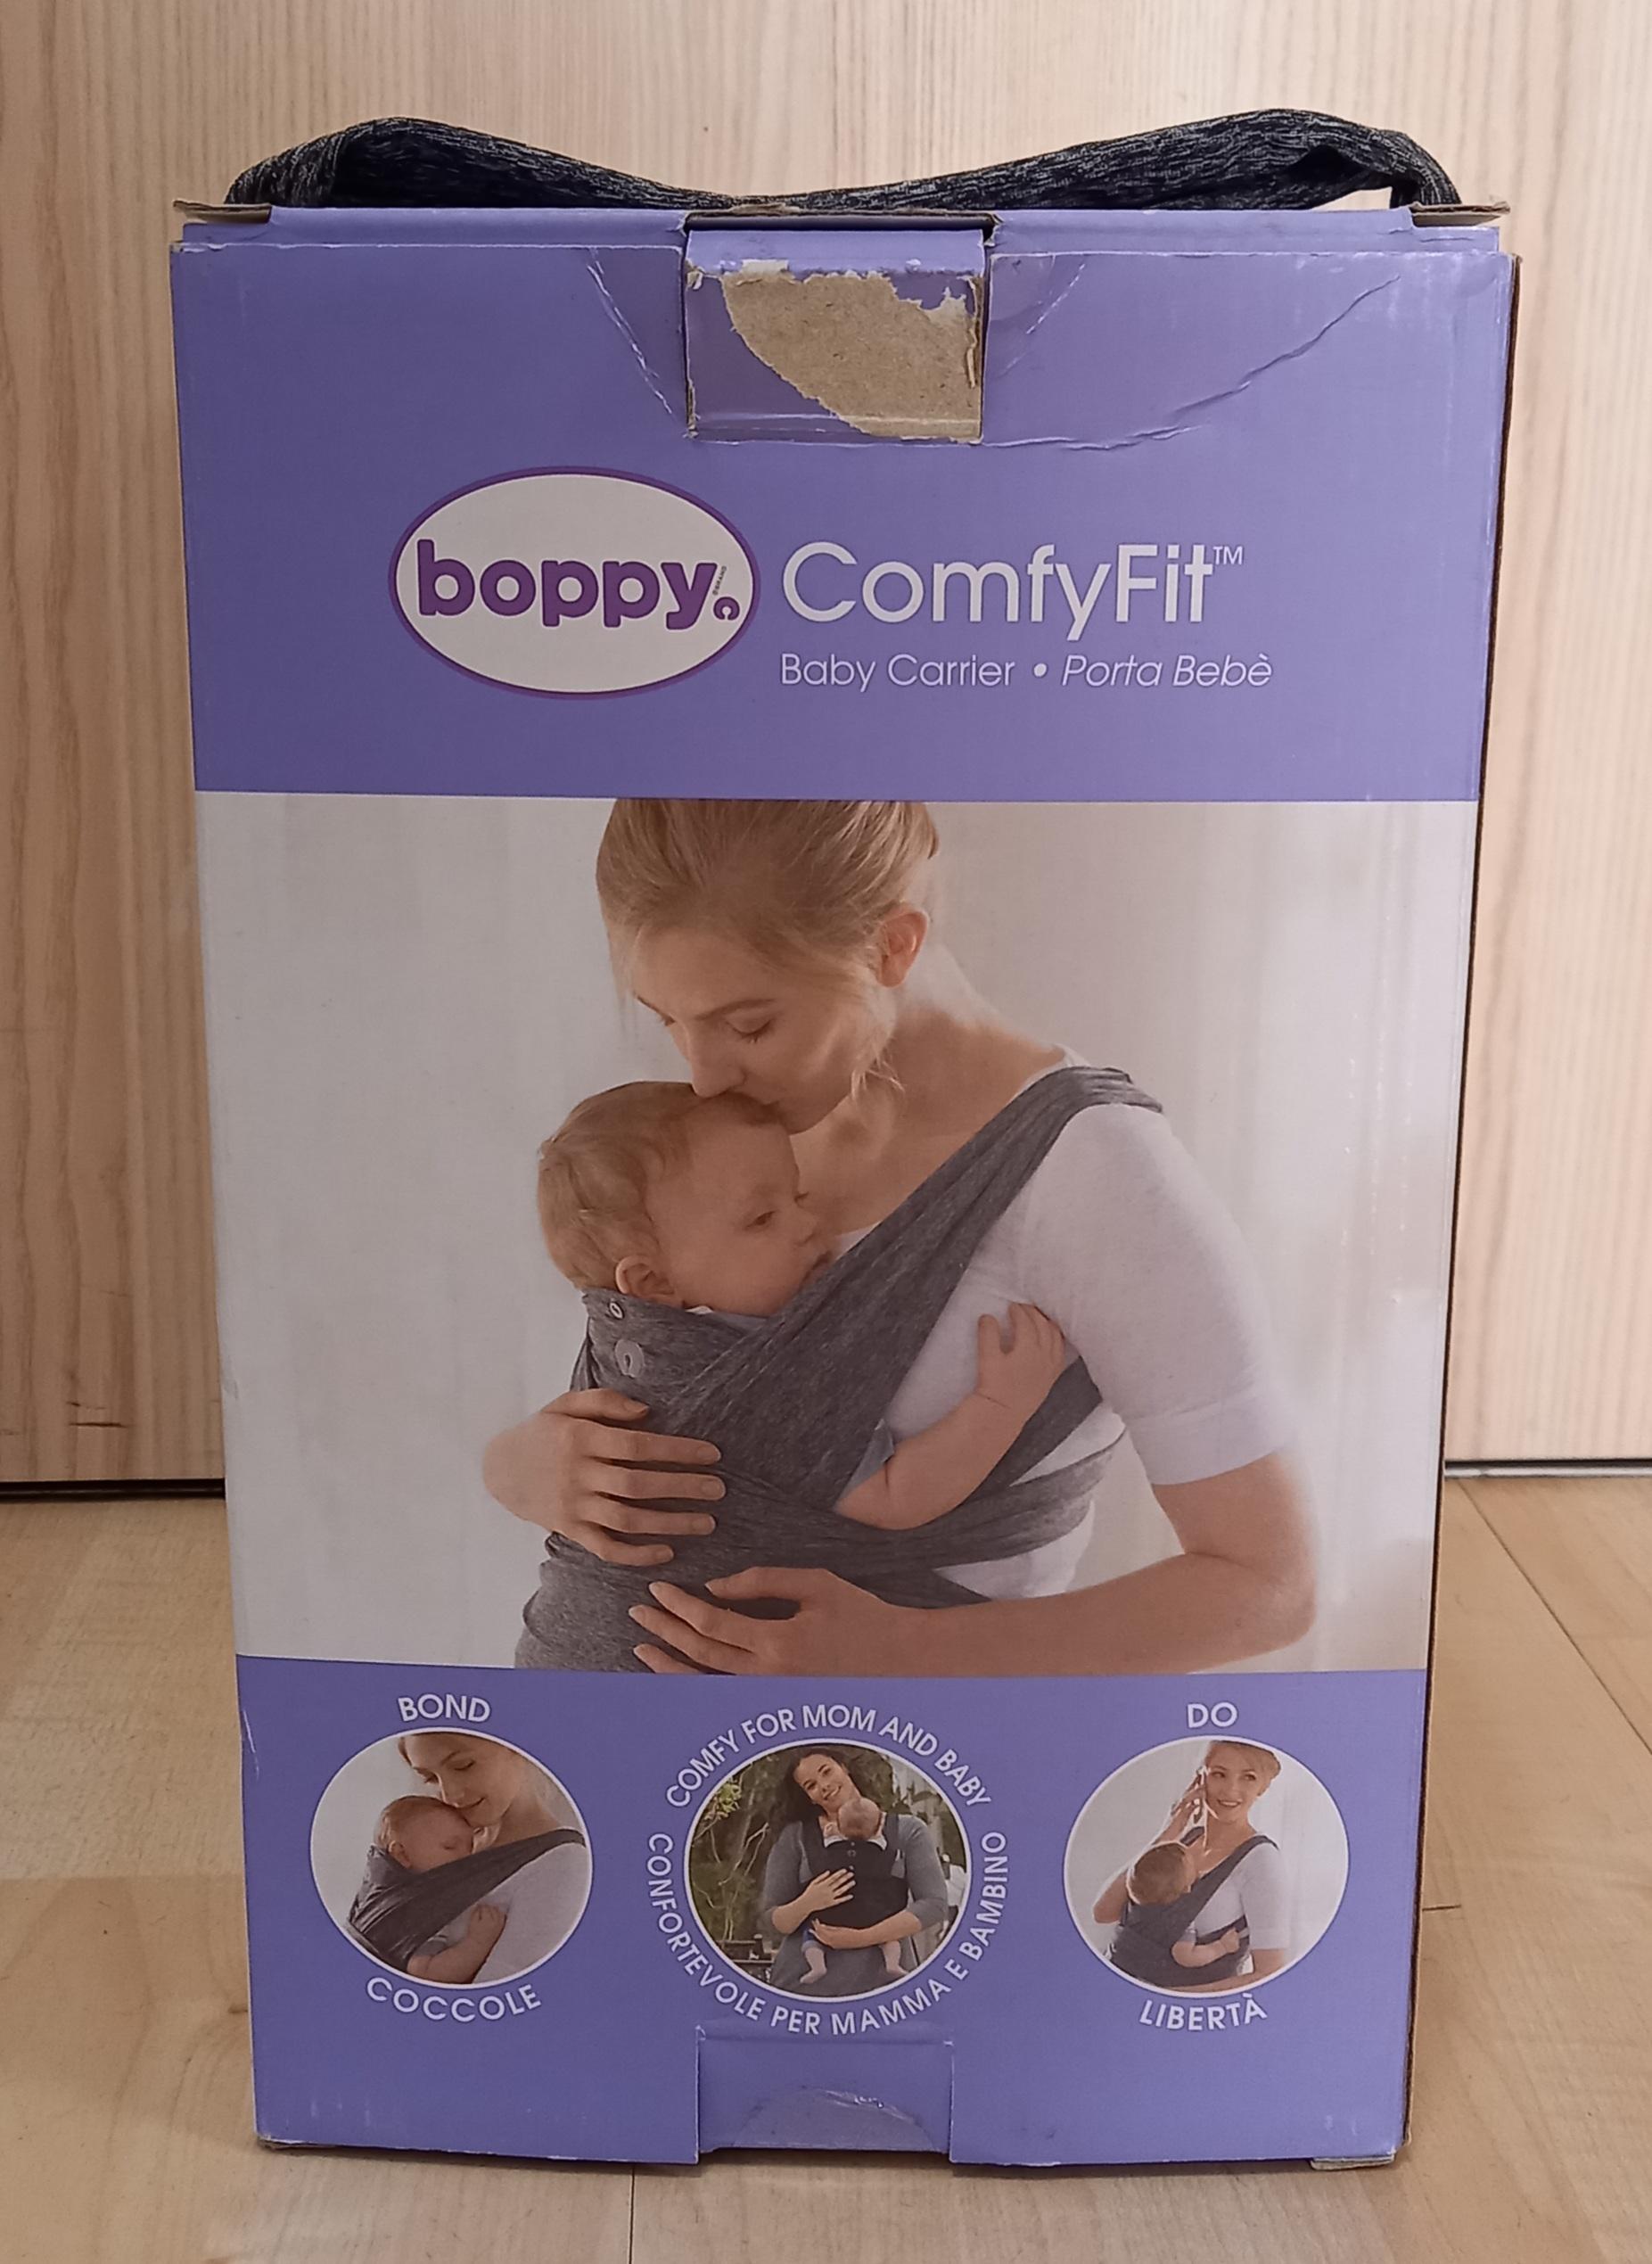 BOBBY COMFIT